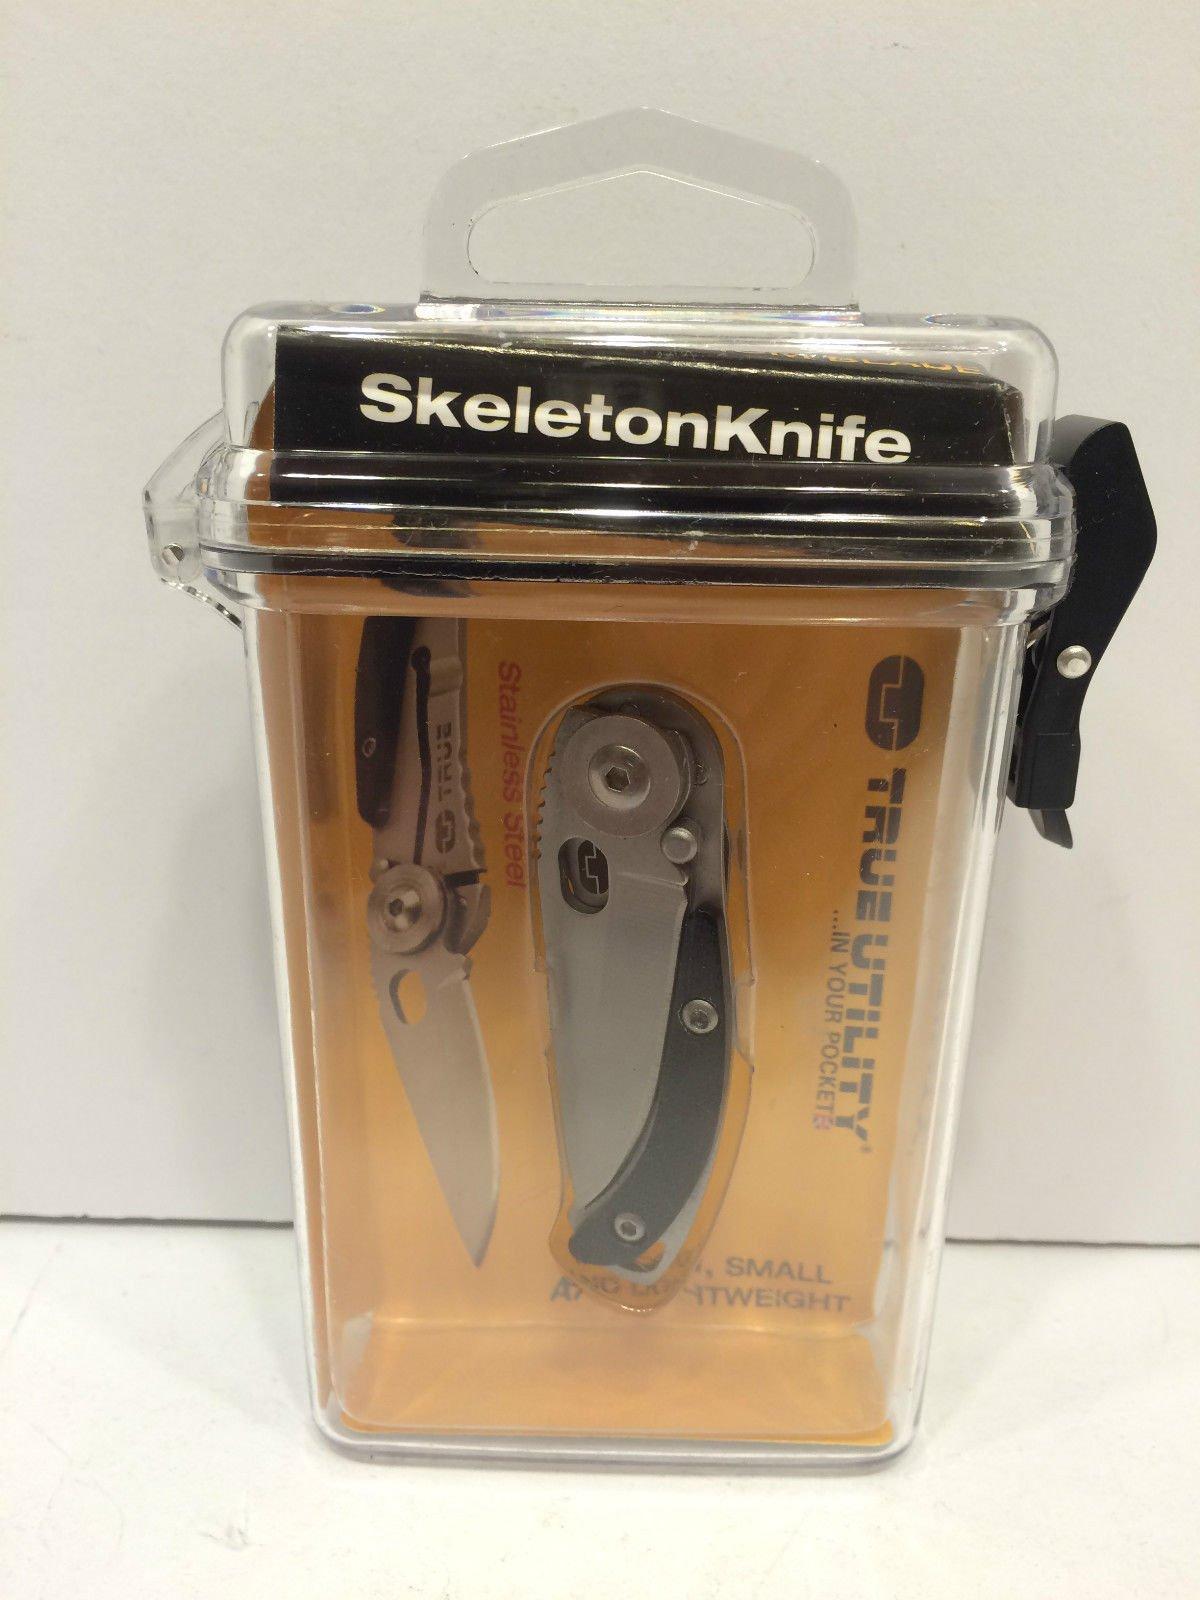 True Utility TU571 Skeleton Knife Open Frame Lock Knife 4cm ,product_by: paloli1015_12161980113686